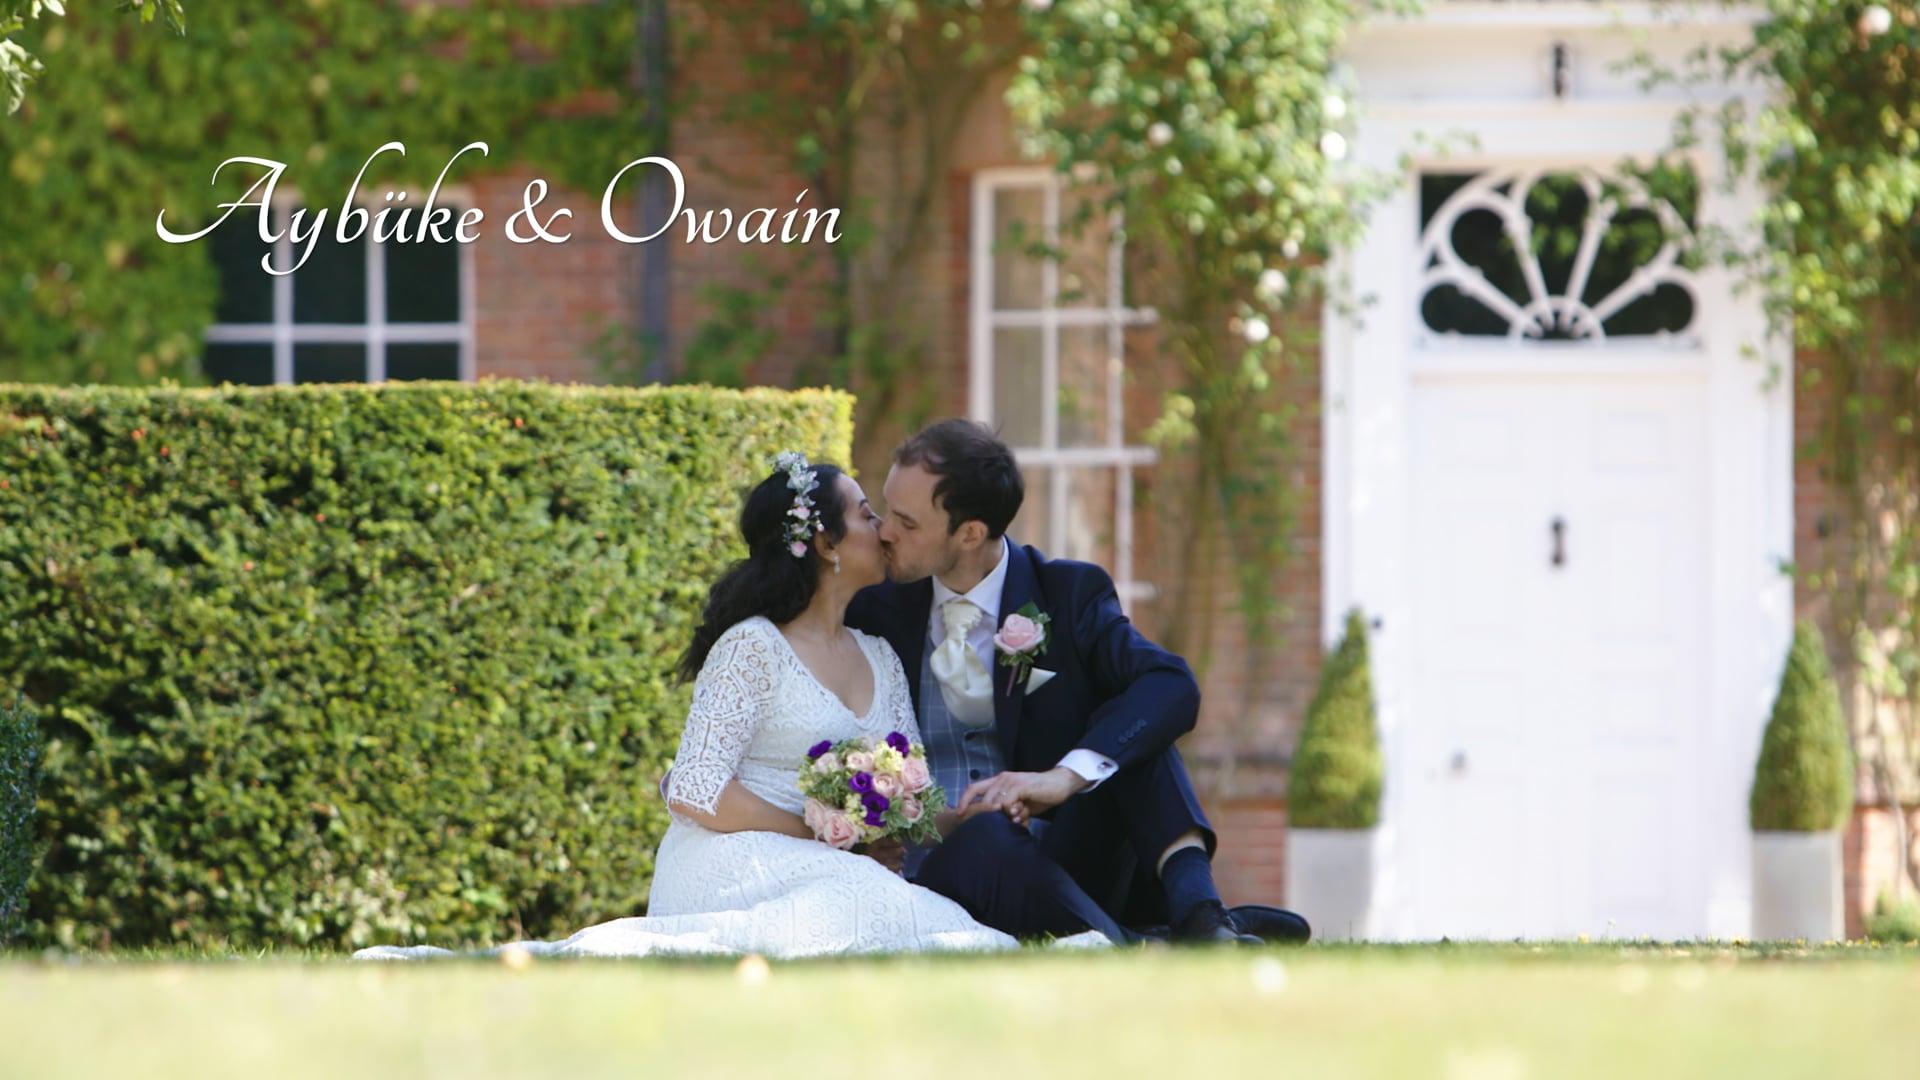 Aybuke & Owain - Wedding Highlights (Event)